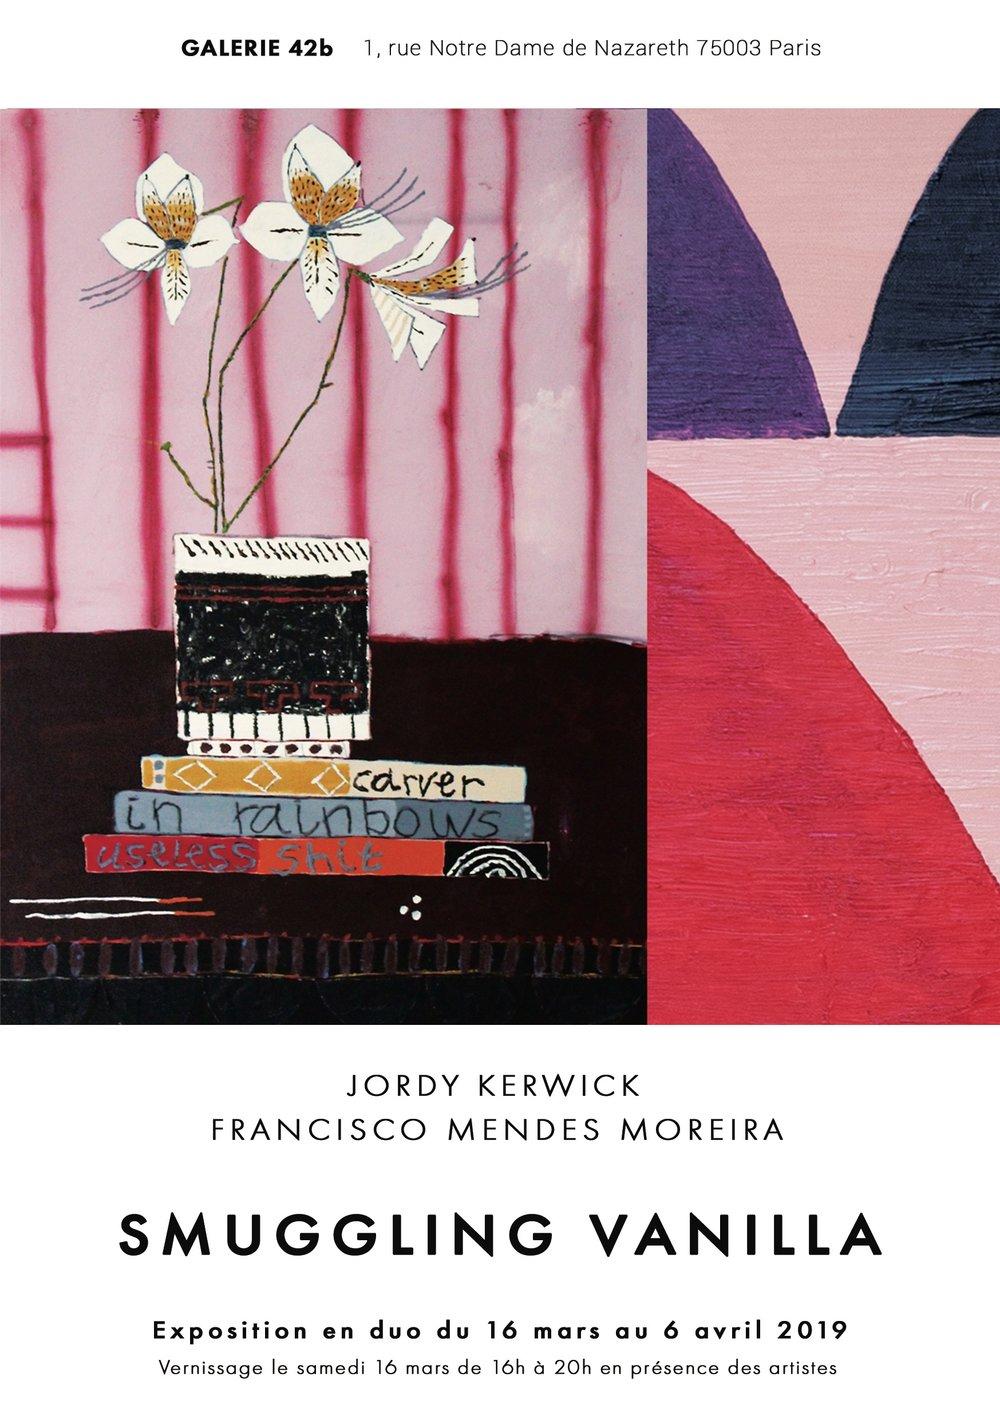 Invitation JORDY KERWICK & FRANCISCO MENDES MOREIRA - SMUGGLING VANILLA